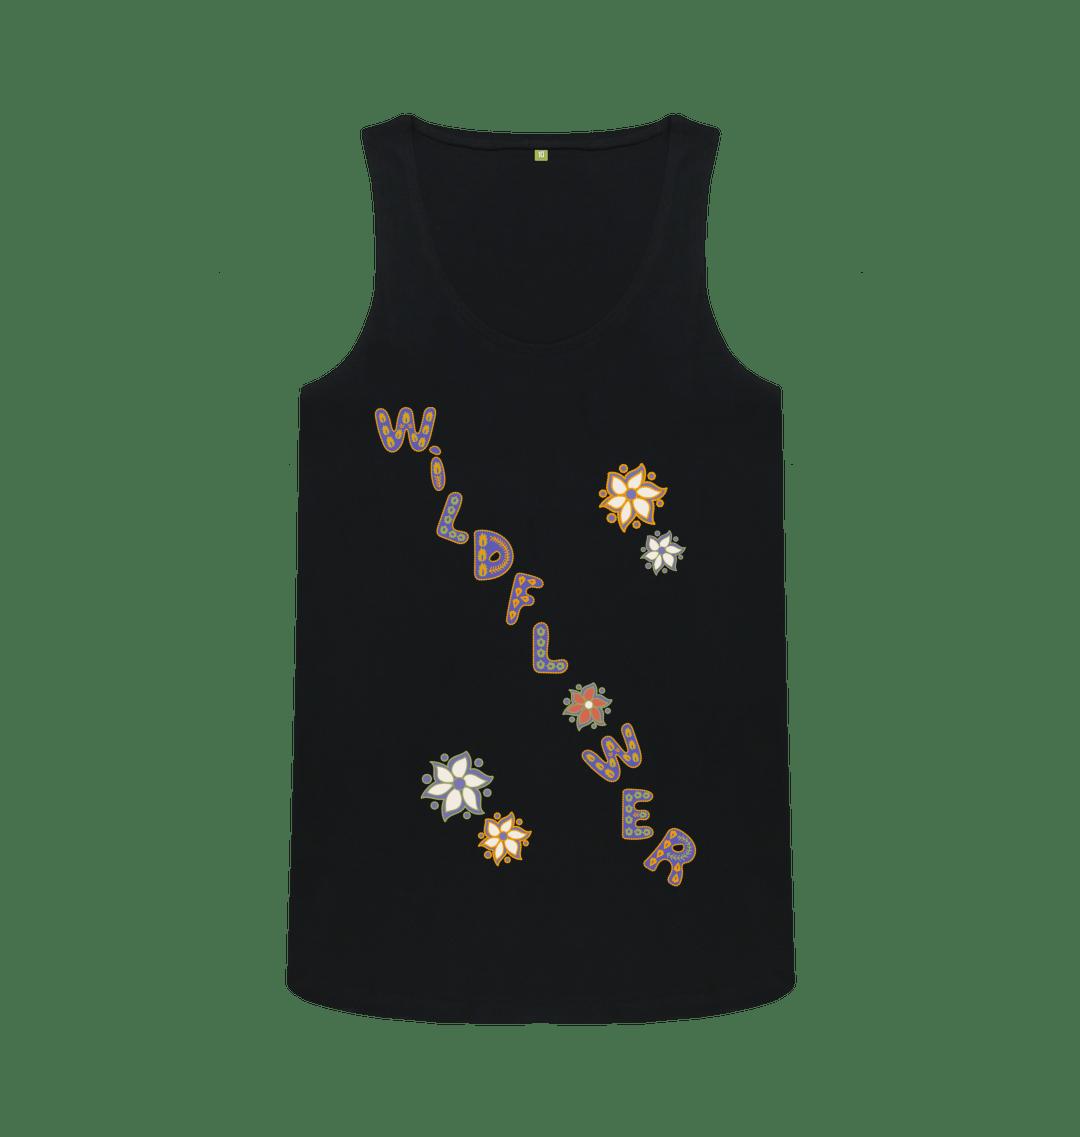 Nature Lovers Wildflower Women's Eco Vest T Shirt - Organic Cotton, Vegan black